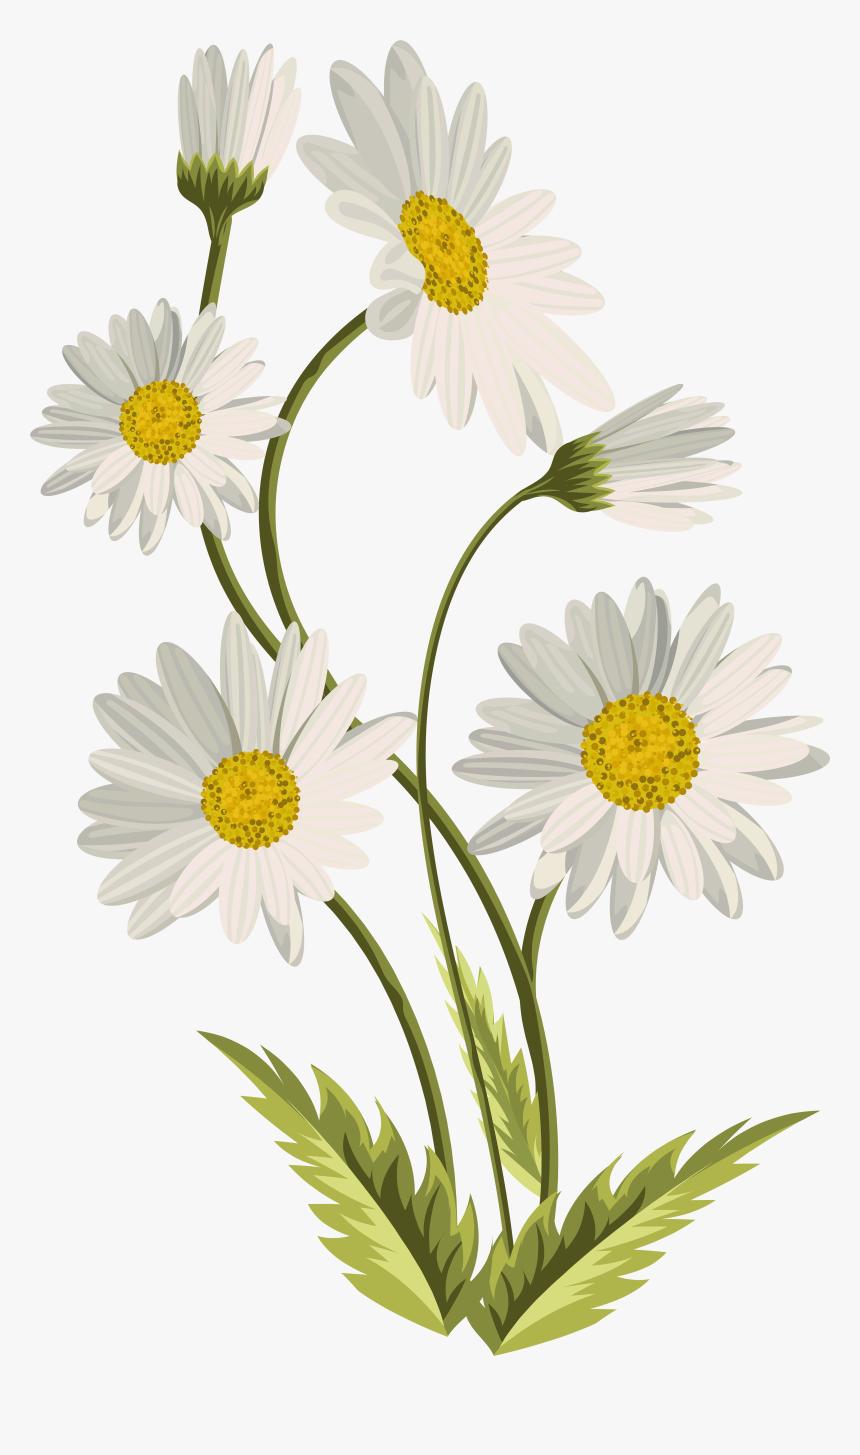 Common Daisy Art Clip Art - Transparent Background Daisy ...